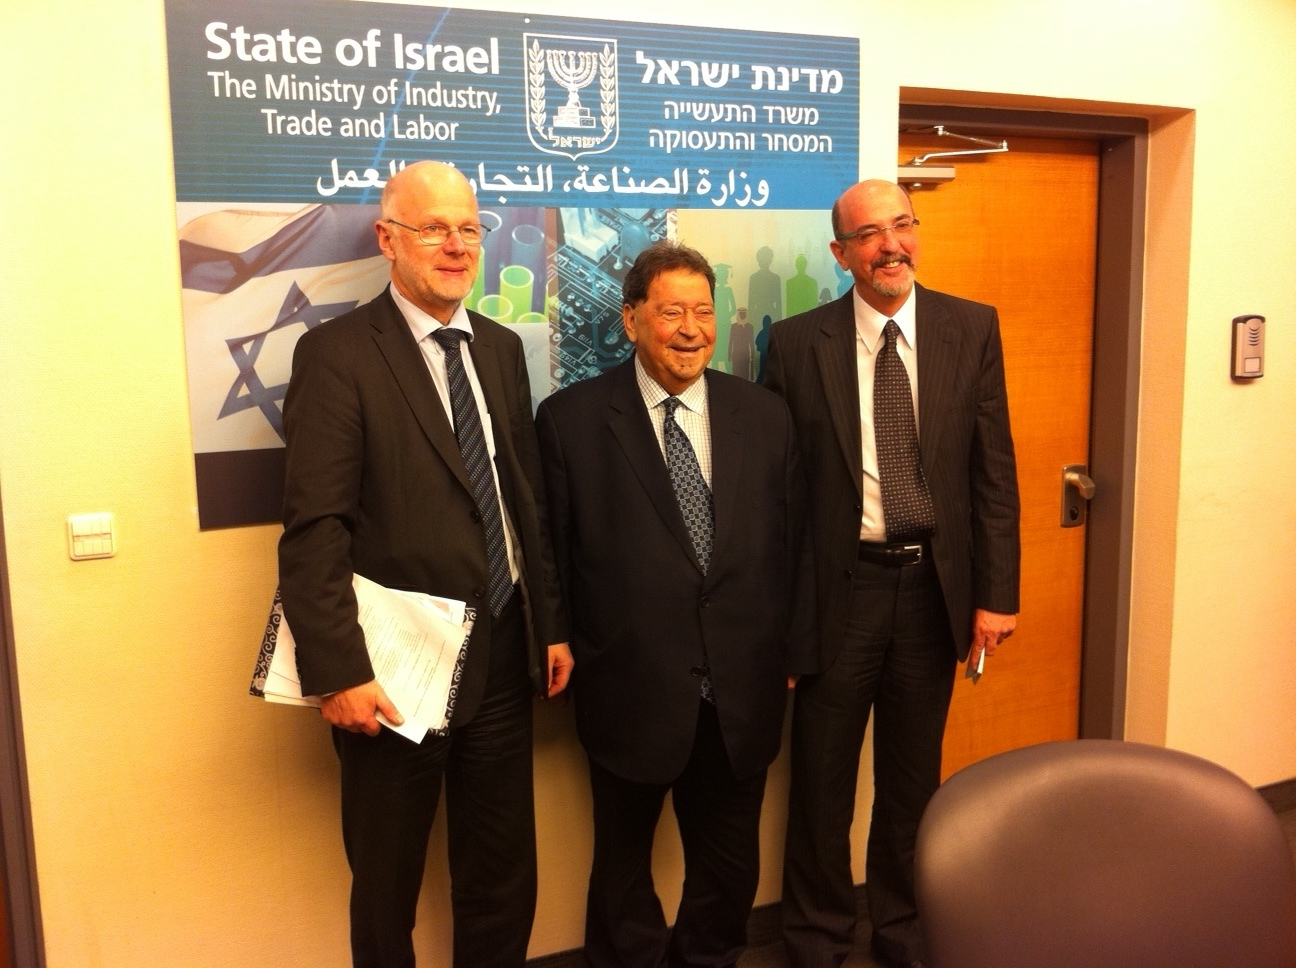 From left: Staffan Nilsson, Benjamin Ben-Eliezer, Yehuda TALMON